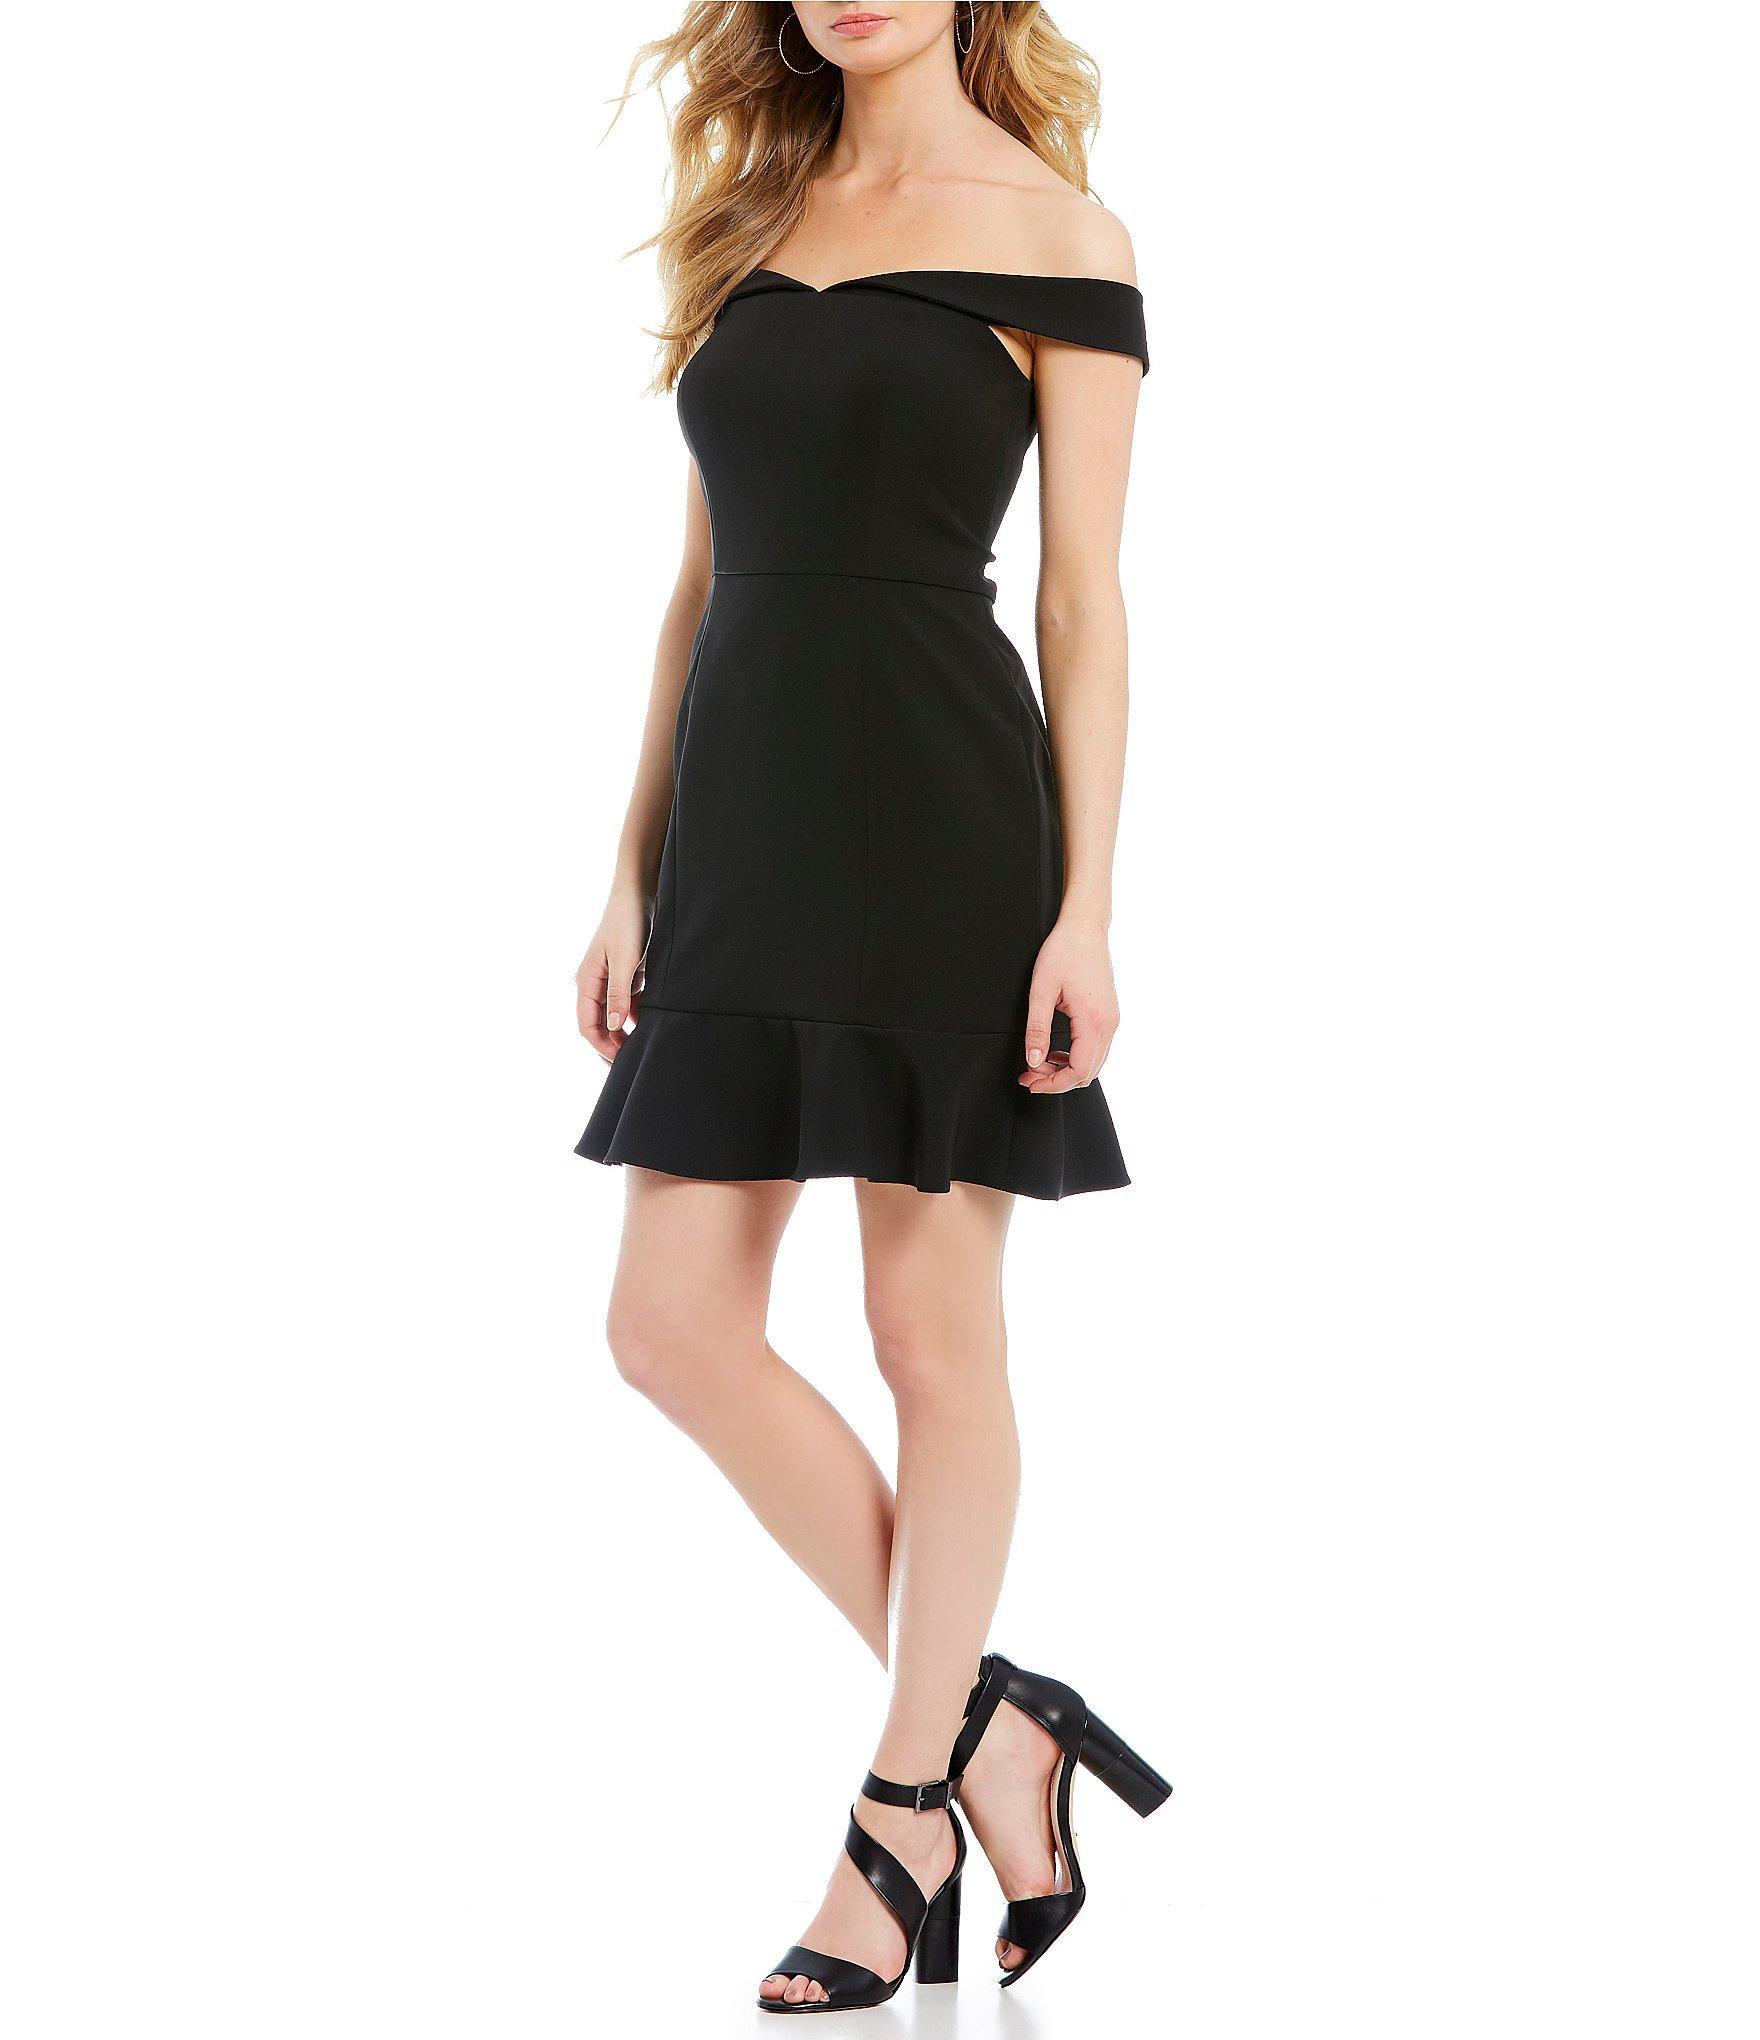 46e47530d2 Lyst - Gianni Bini Suze Off-the-shoulder Ruffle Hem Dress in Black